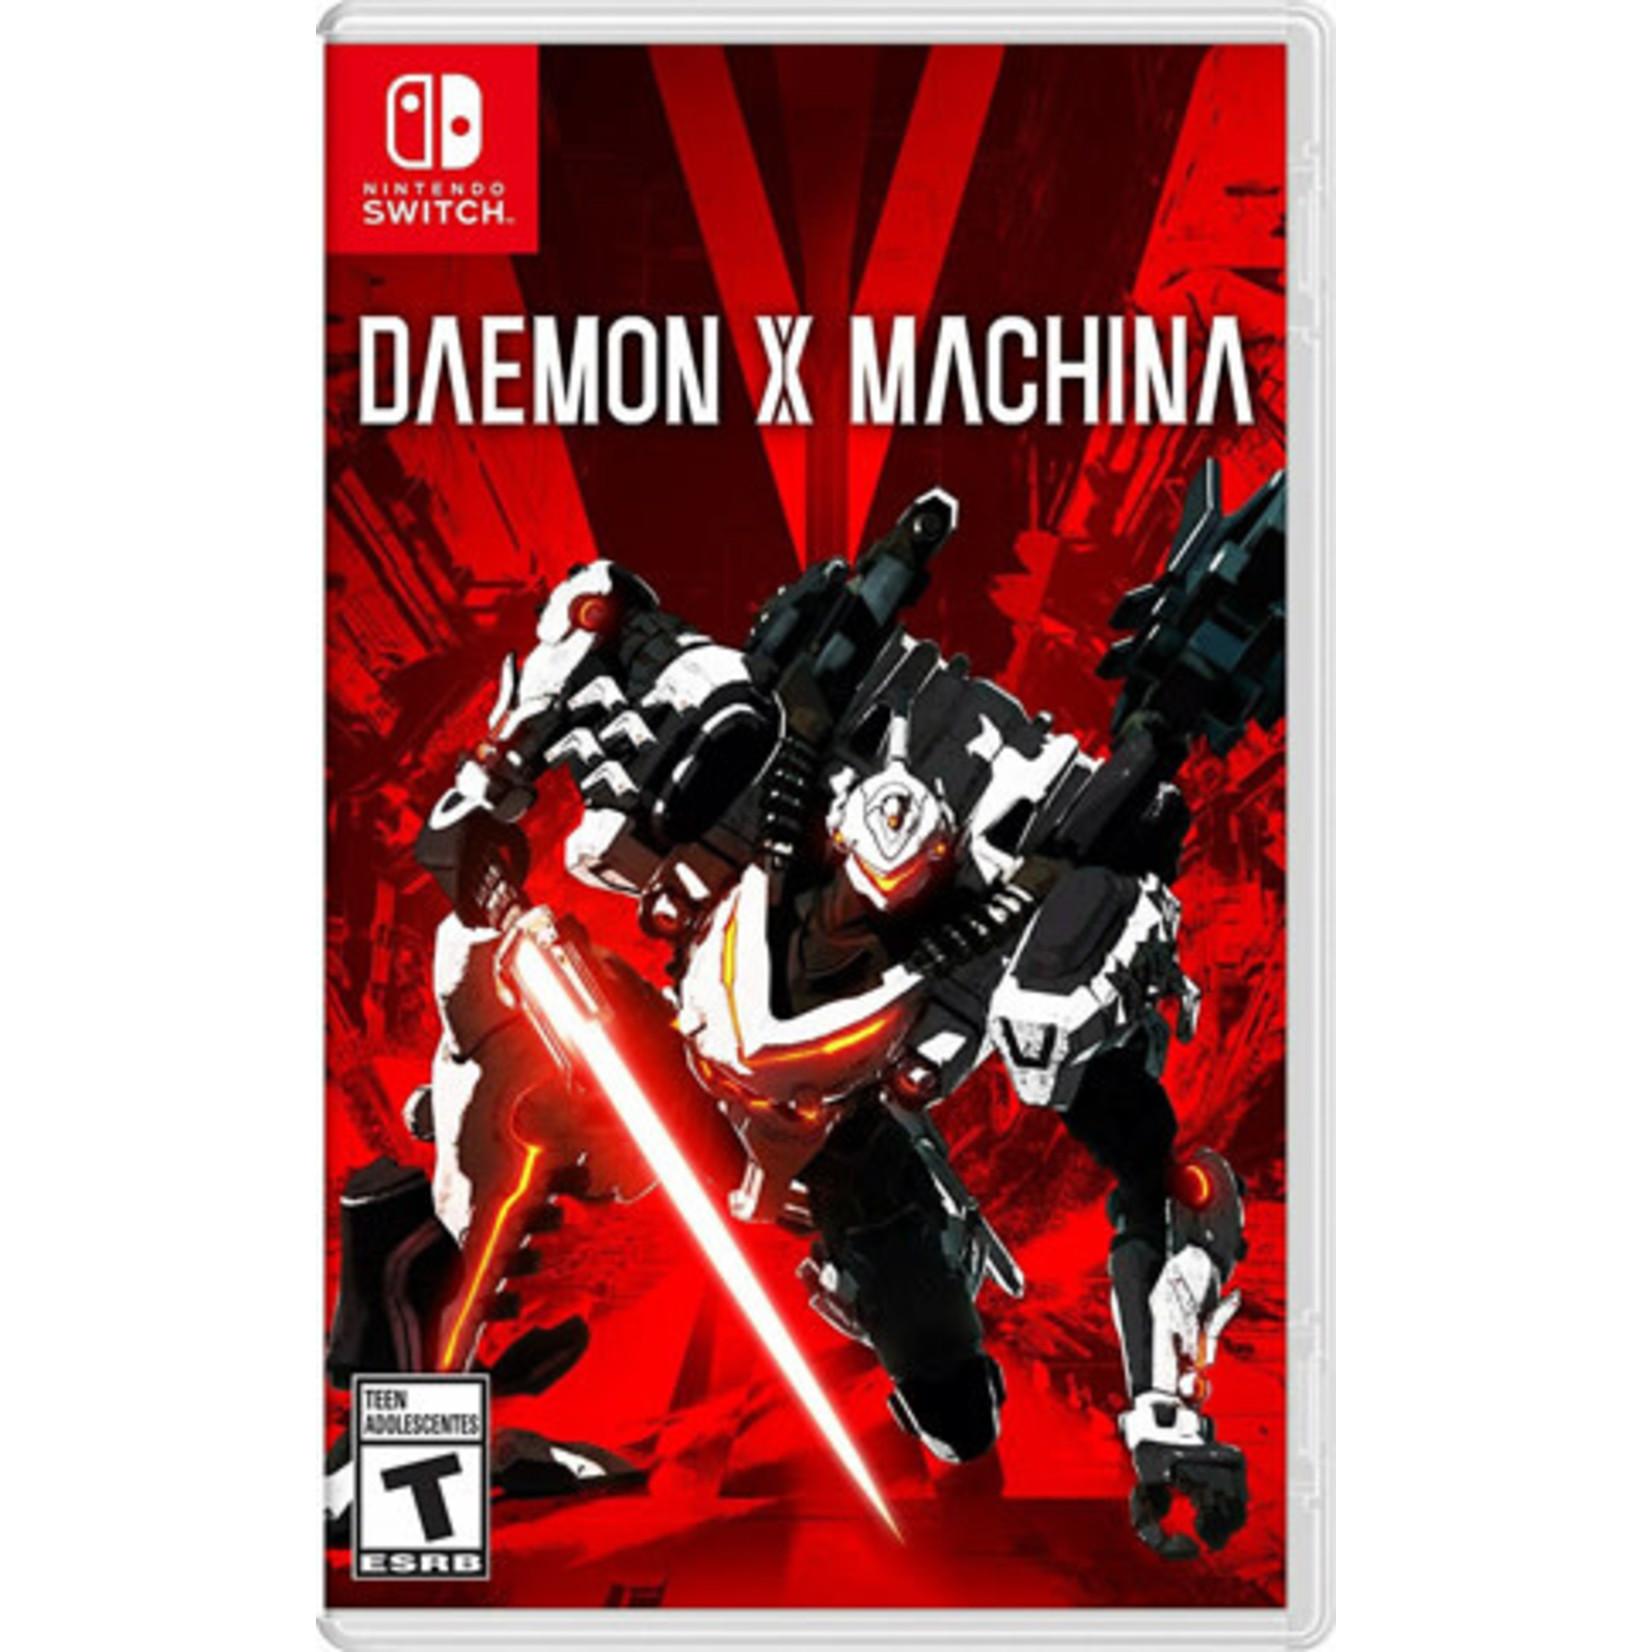 SWITCH-Daemon X Machina